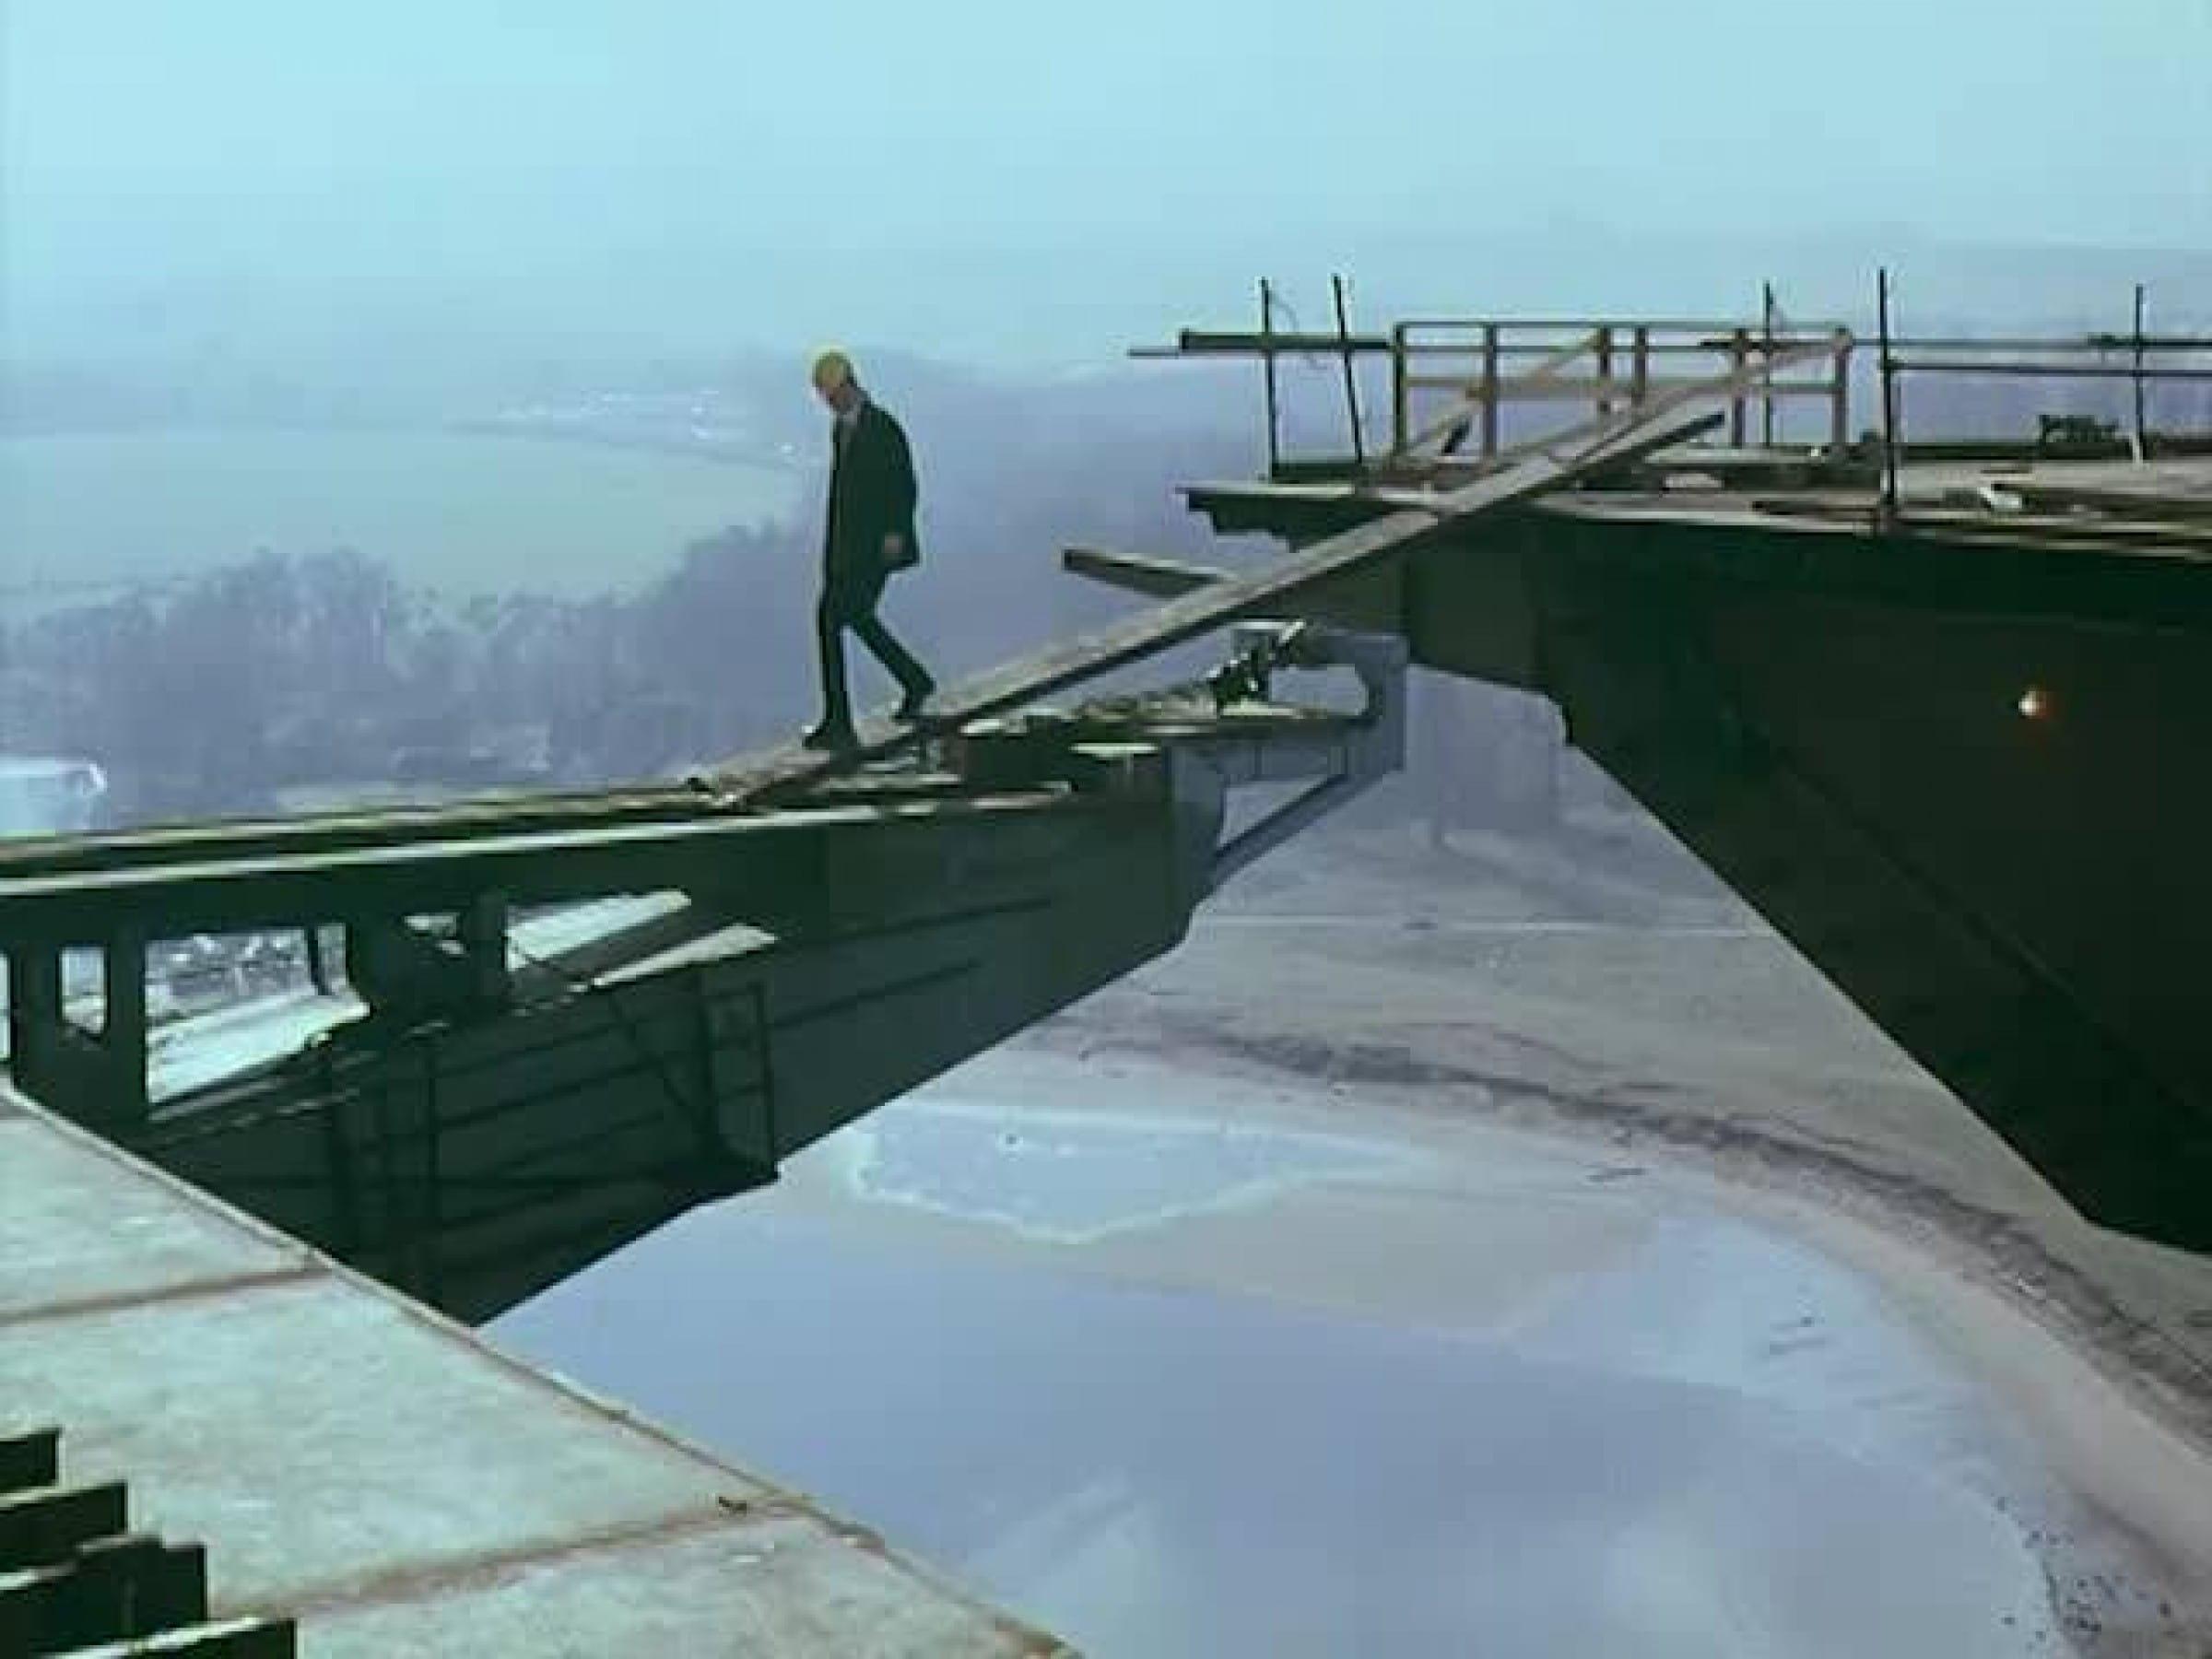 A bridge too far (Erskine Bridge, 1970 (National Library of Scotland))